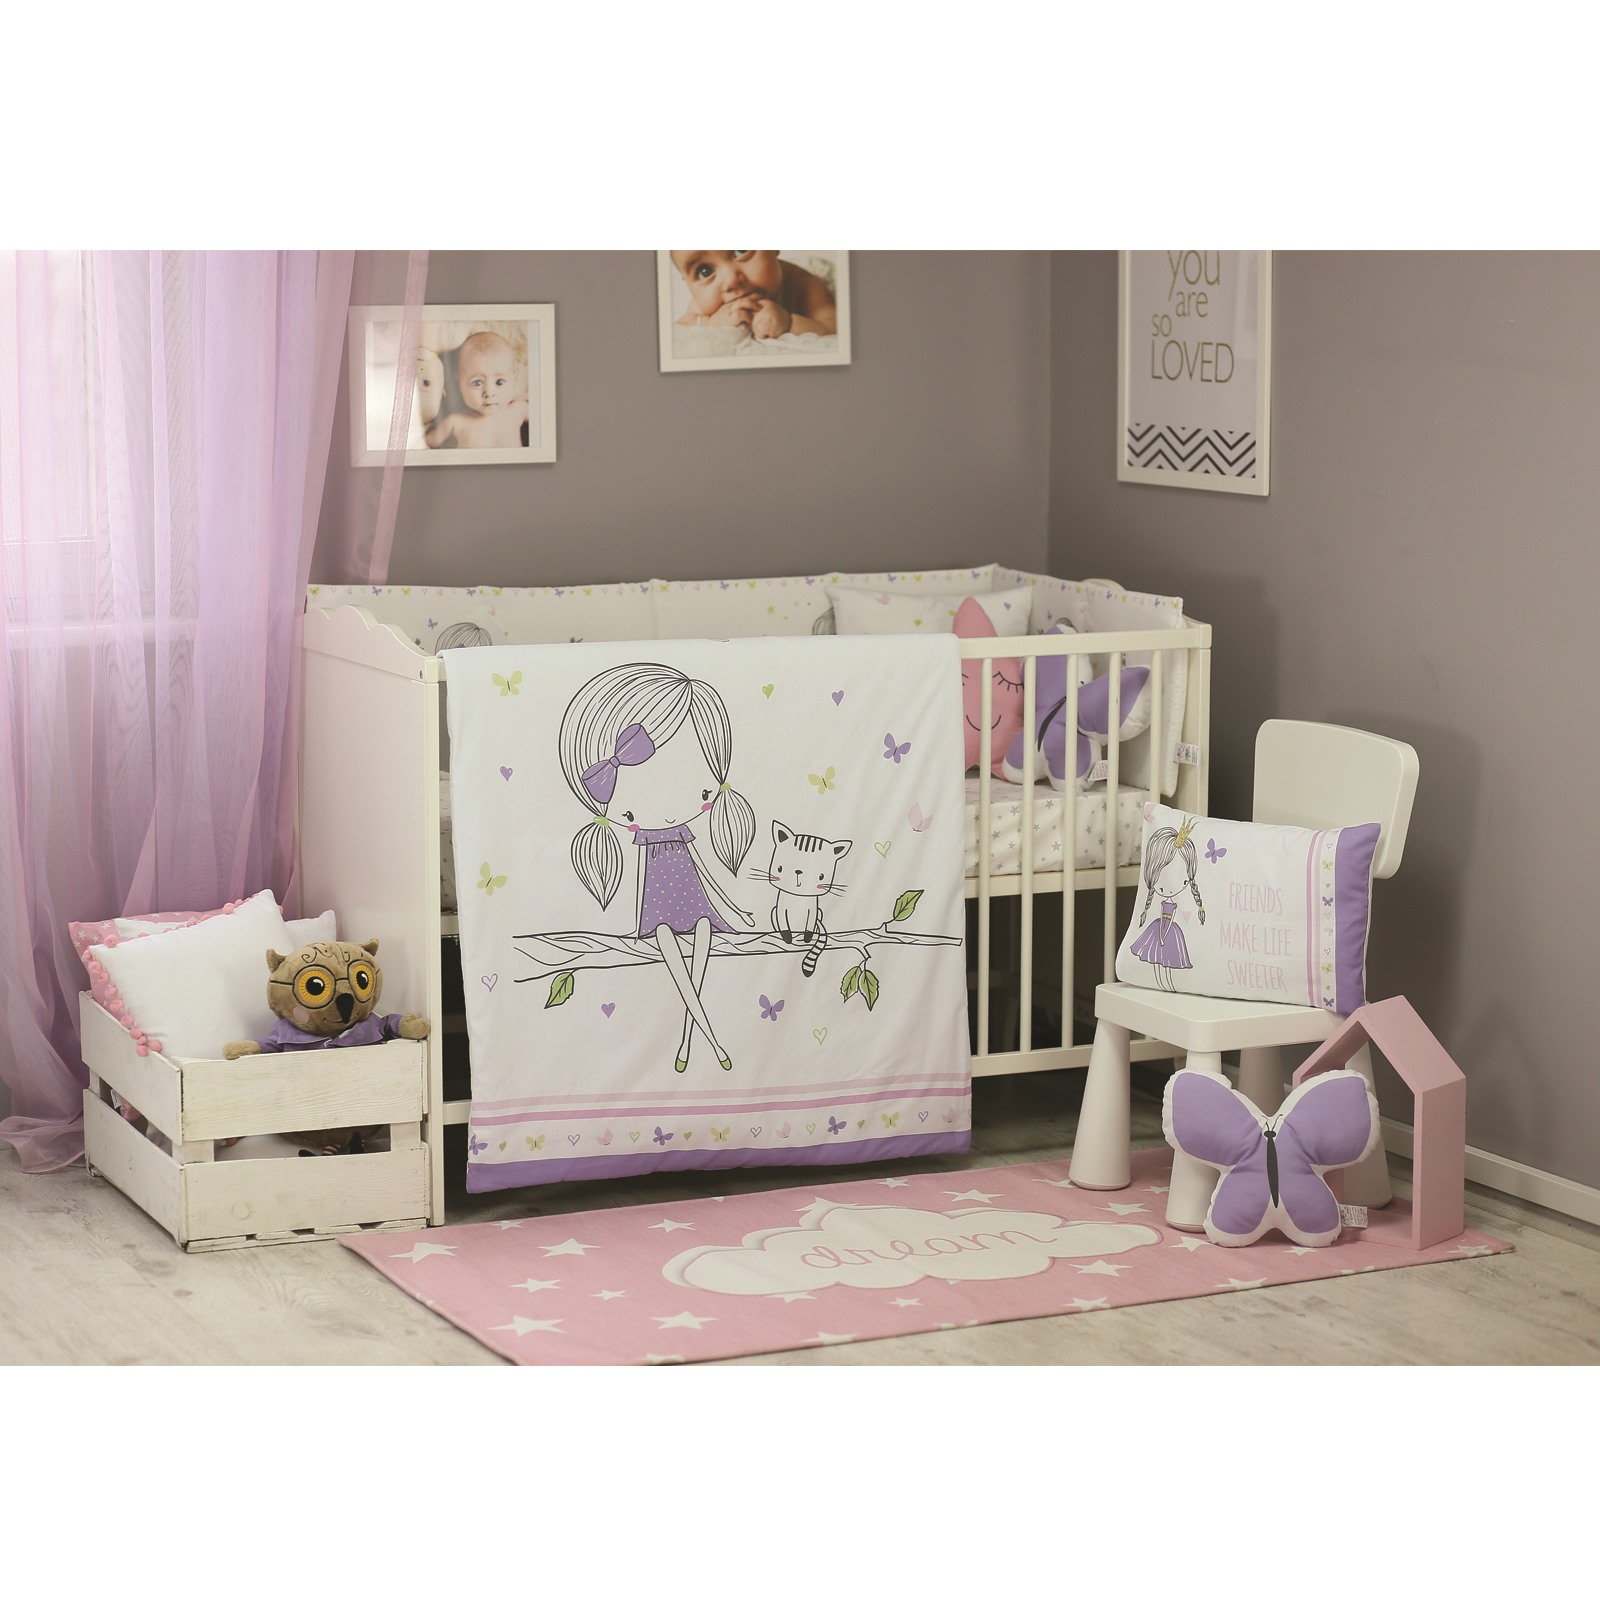 Ebebek Apolena Baby Unicorn Bed Filled Duvet Cover & Pillow Case 2 Pcs Set Keep Warm Bedding Set Children Twin 100% Cottotton